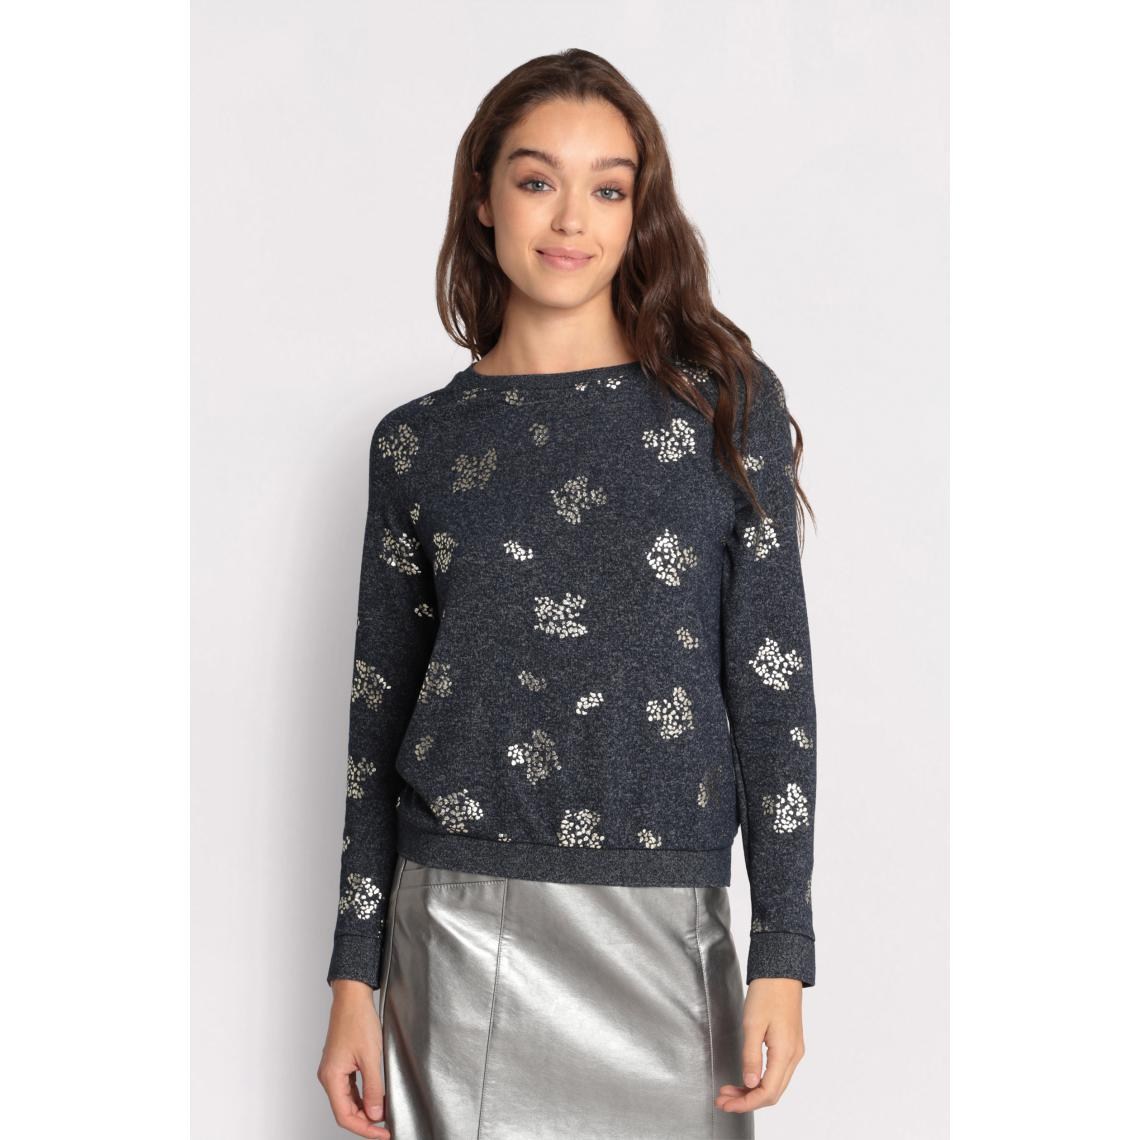 T-shirt manches longues - Cache cache - Modalova